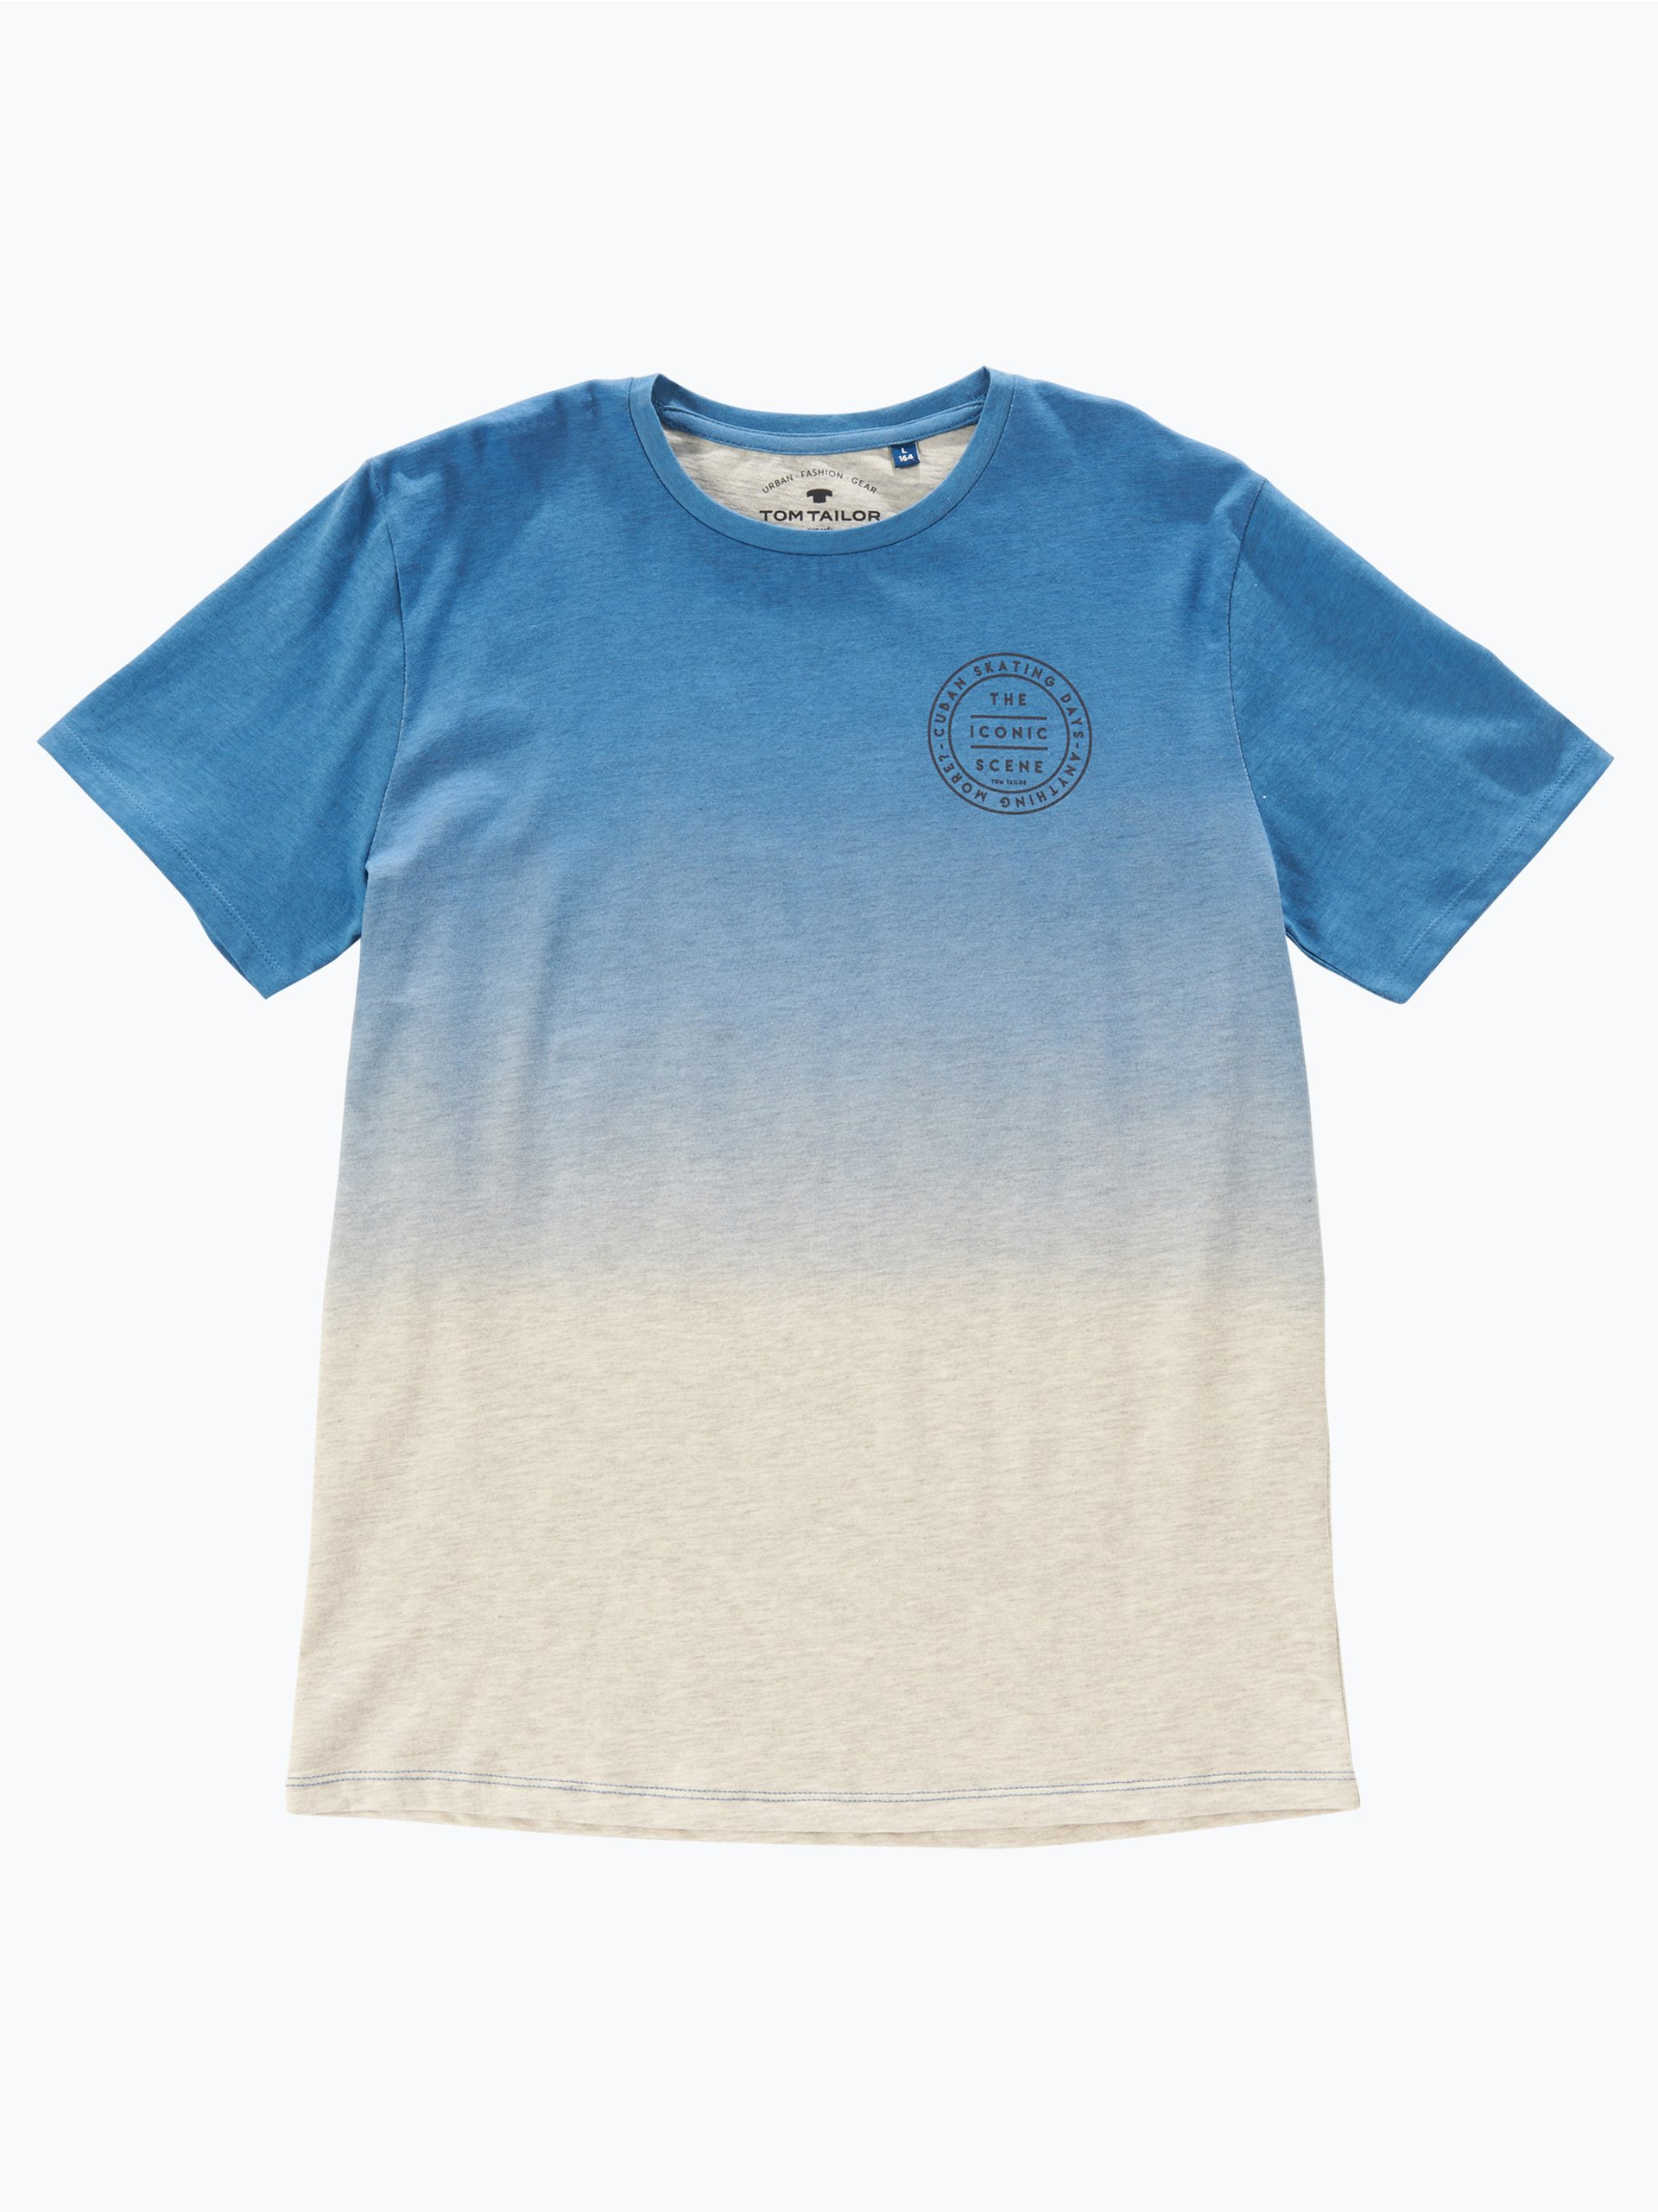 Tom tailor jungen t shirt blau uni online kaufen for Tailored t shirts online